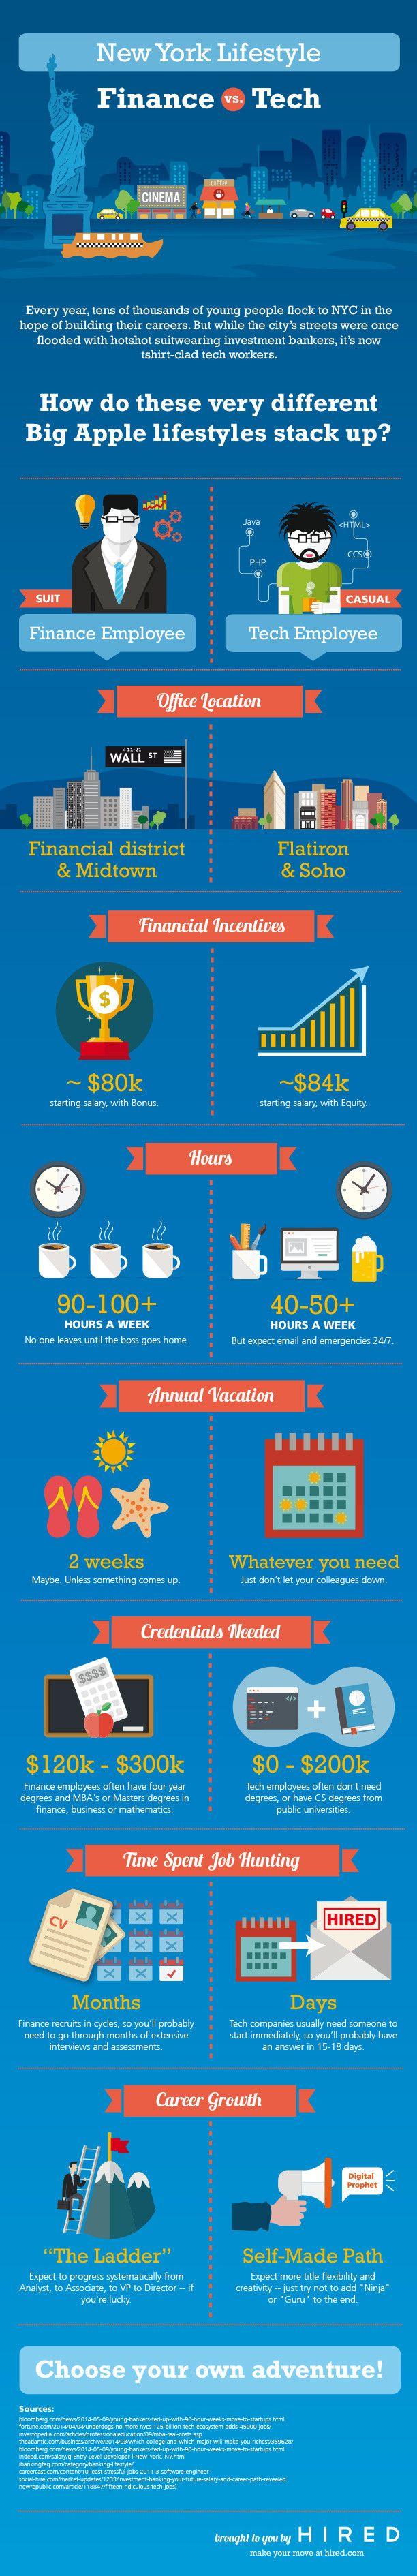 New York Lifestyle Finance vs Tech? #infographic